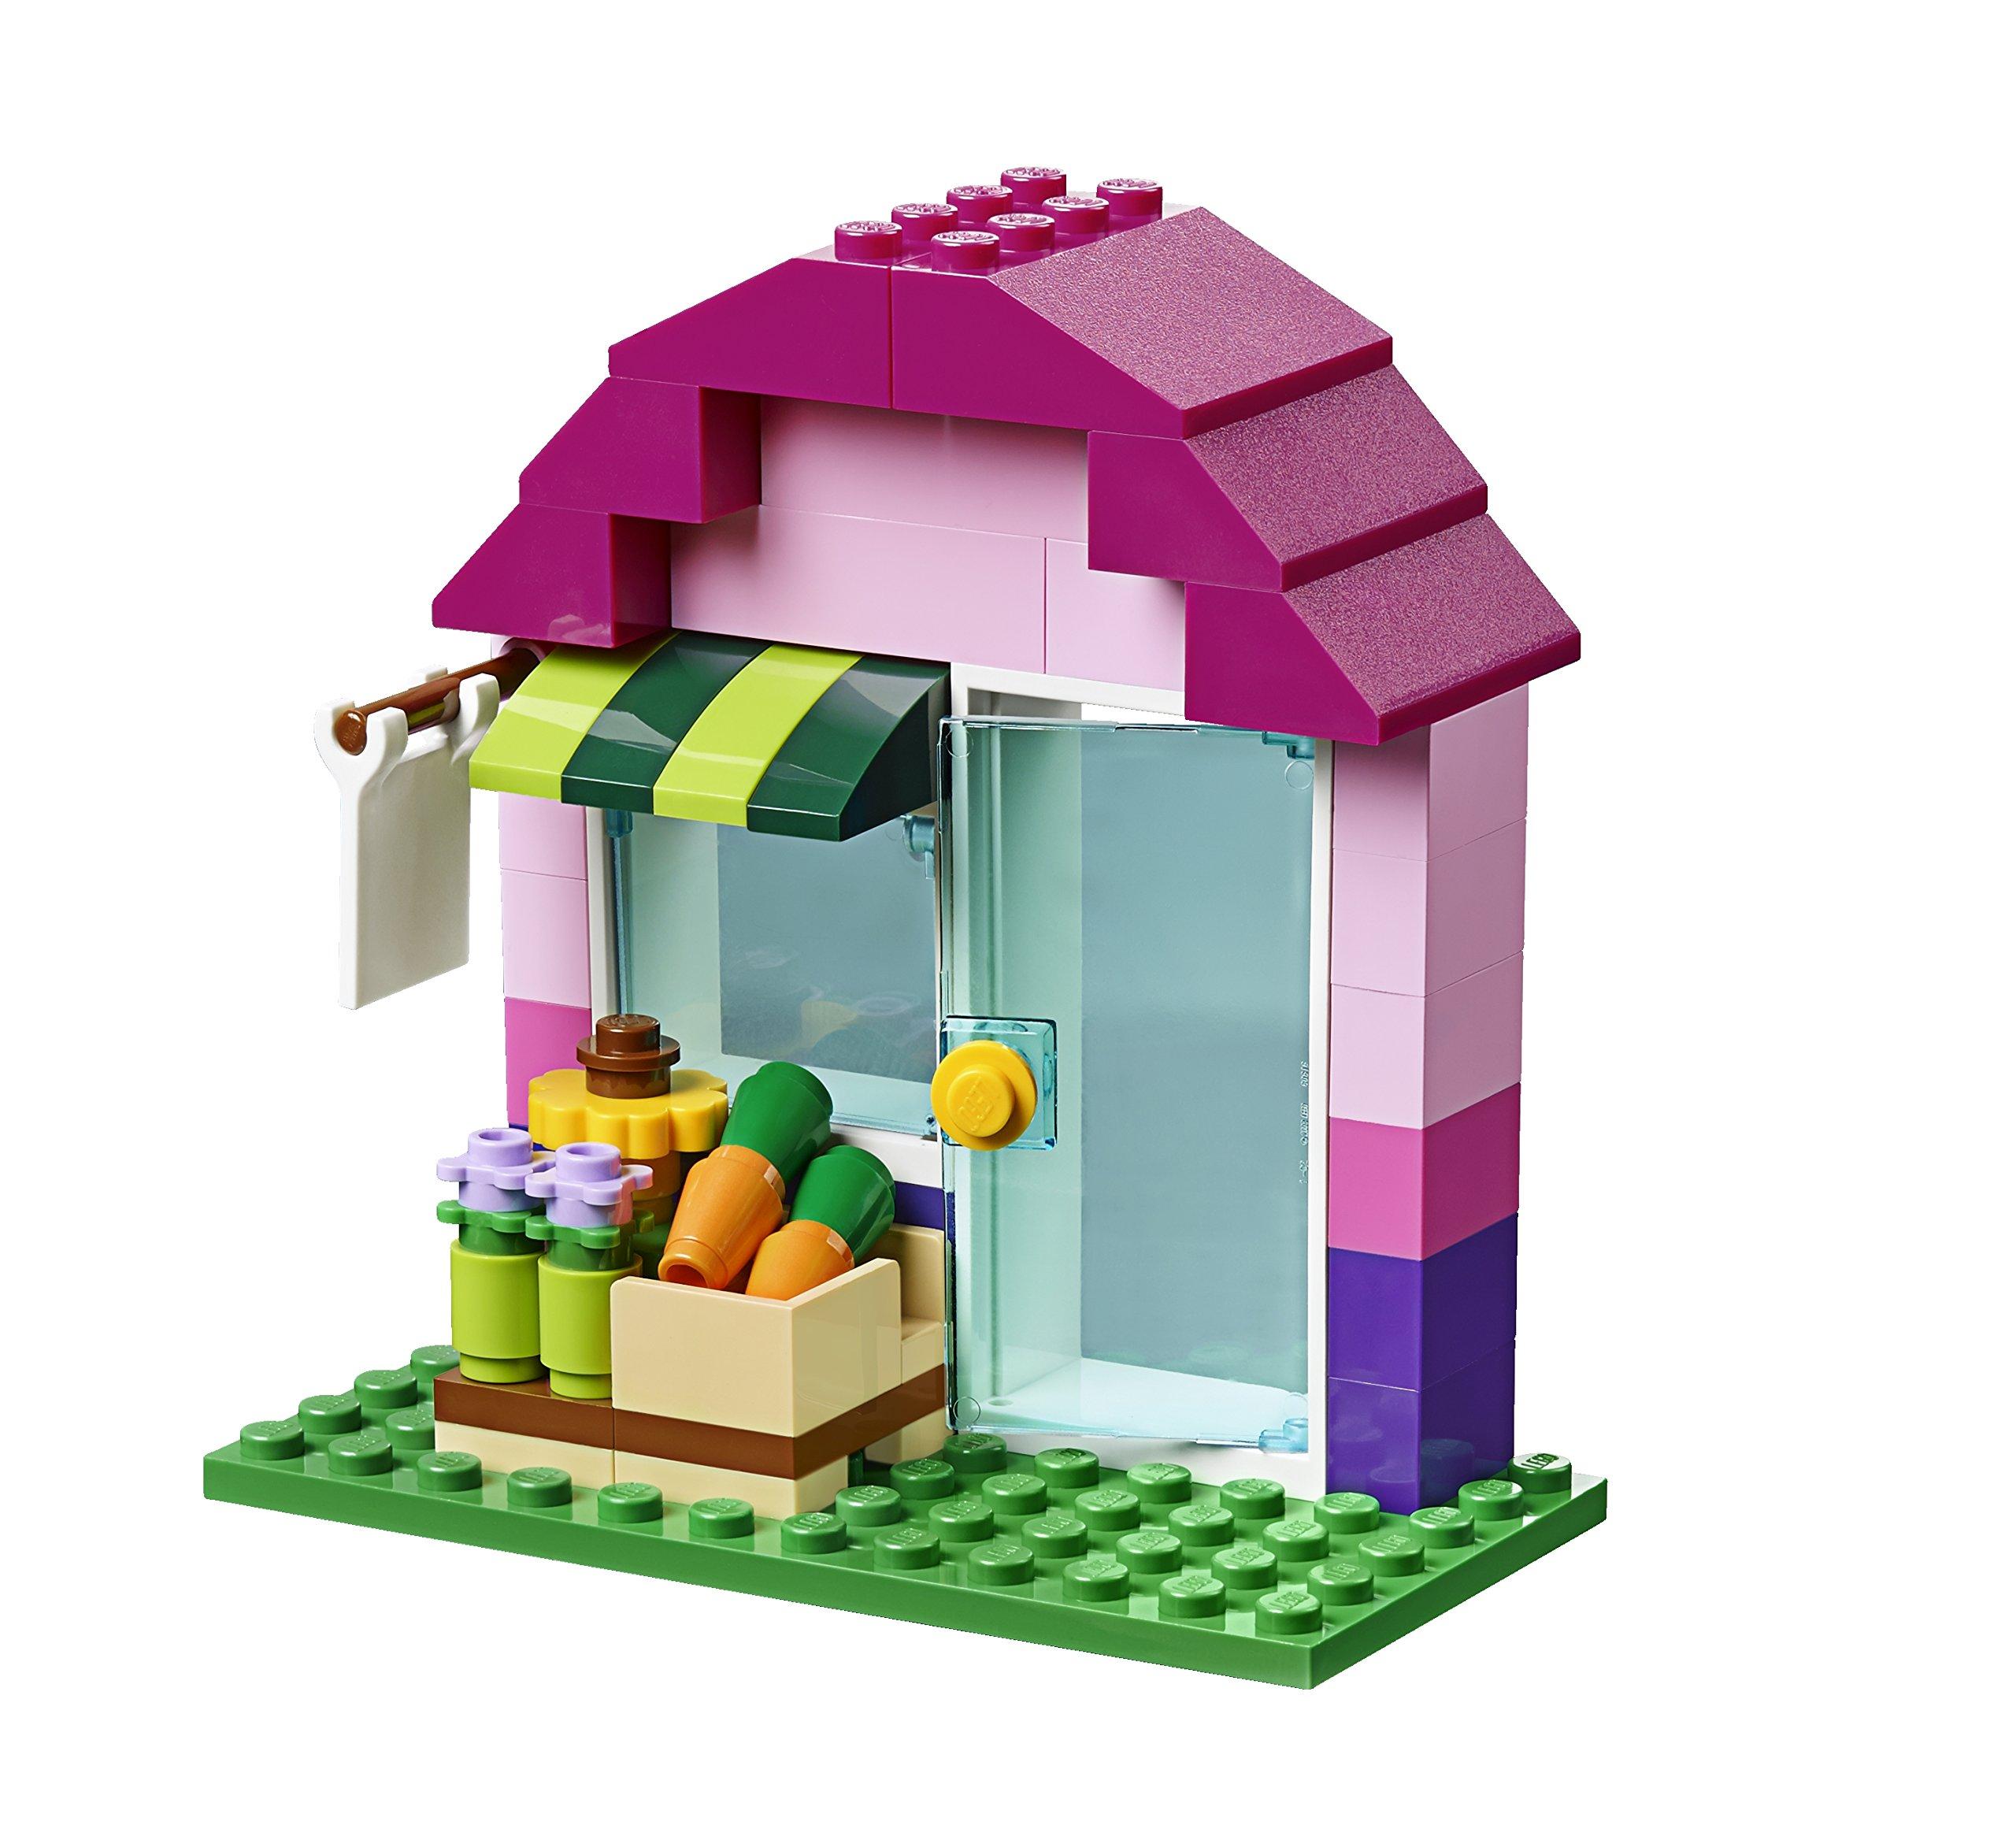 LEGO Classic Creative Bricks 10692 Building Blocks, Learning Toy by LEGO (Image #7)